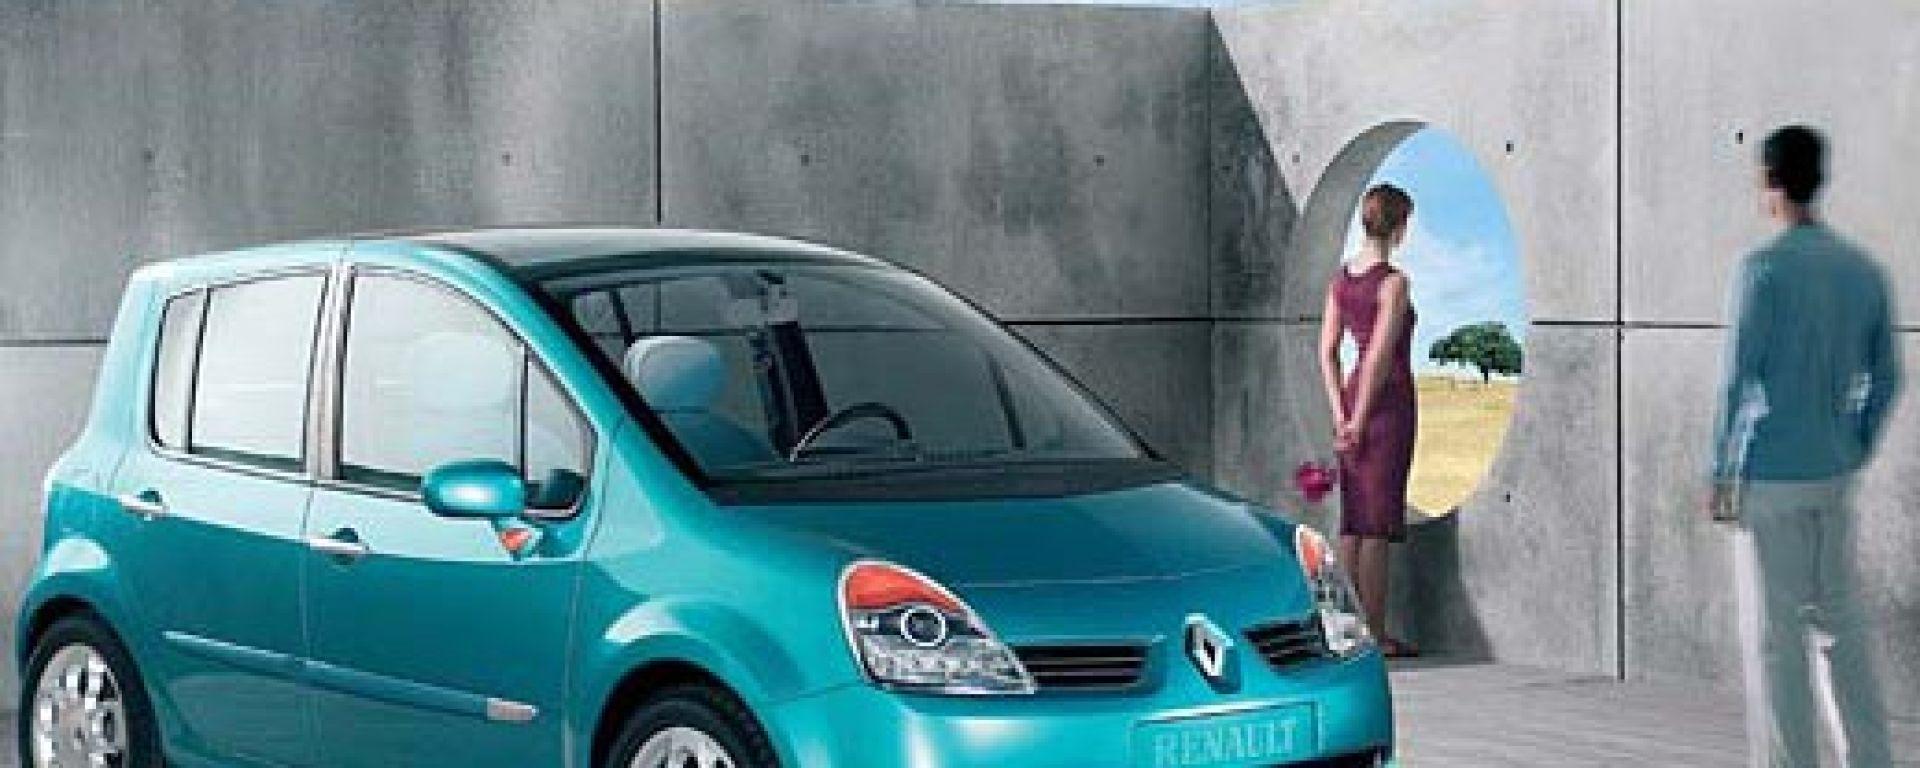 Crash test: Renault Modus